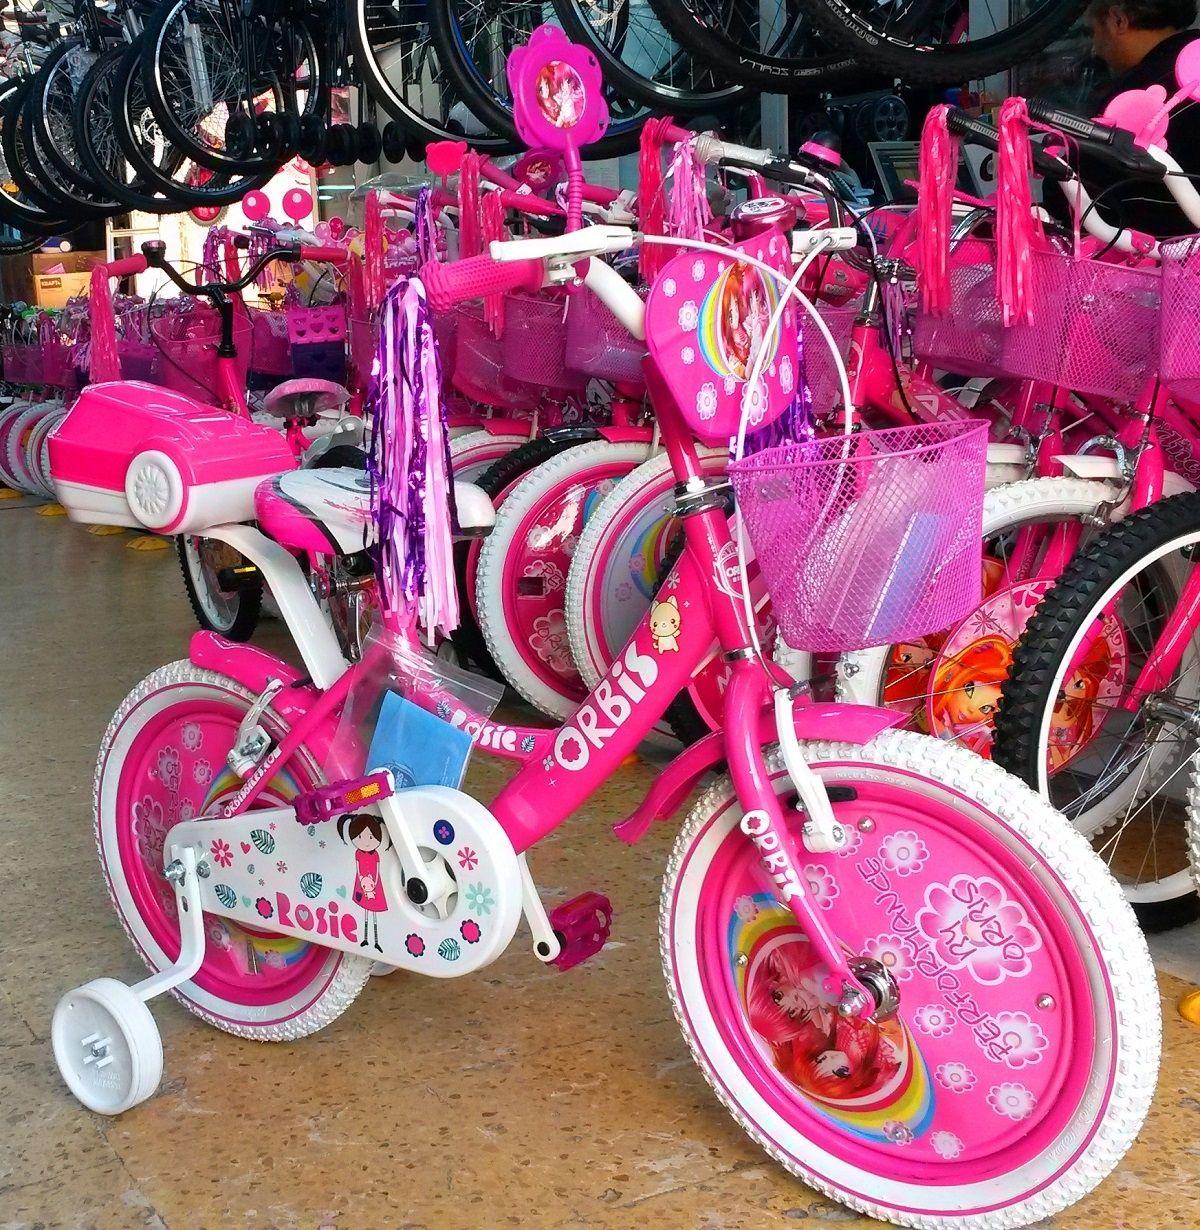 Orbis 16 Jant Rosie 4 8 Yas Cocuk Bisikleti Ayhan Cocuk Anne